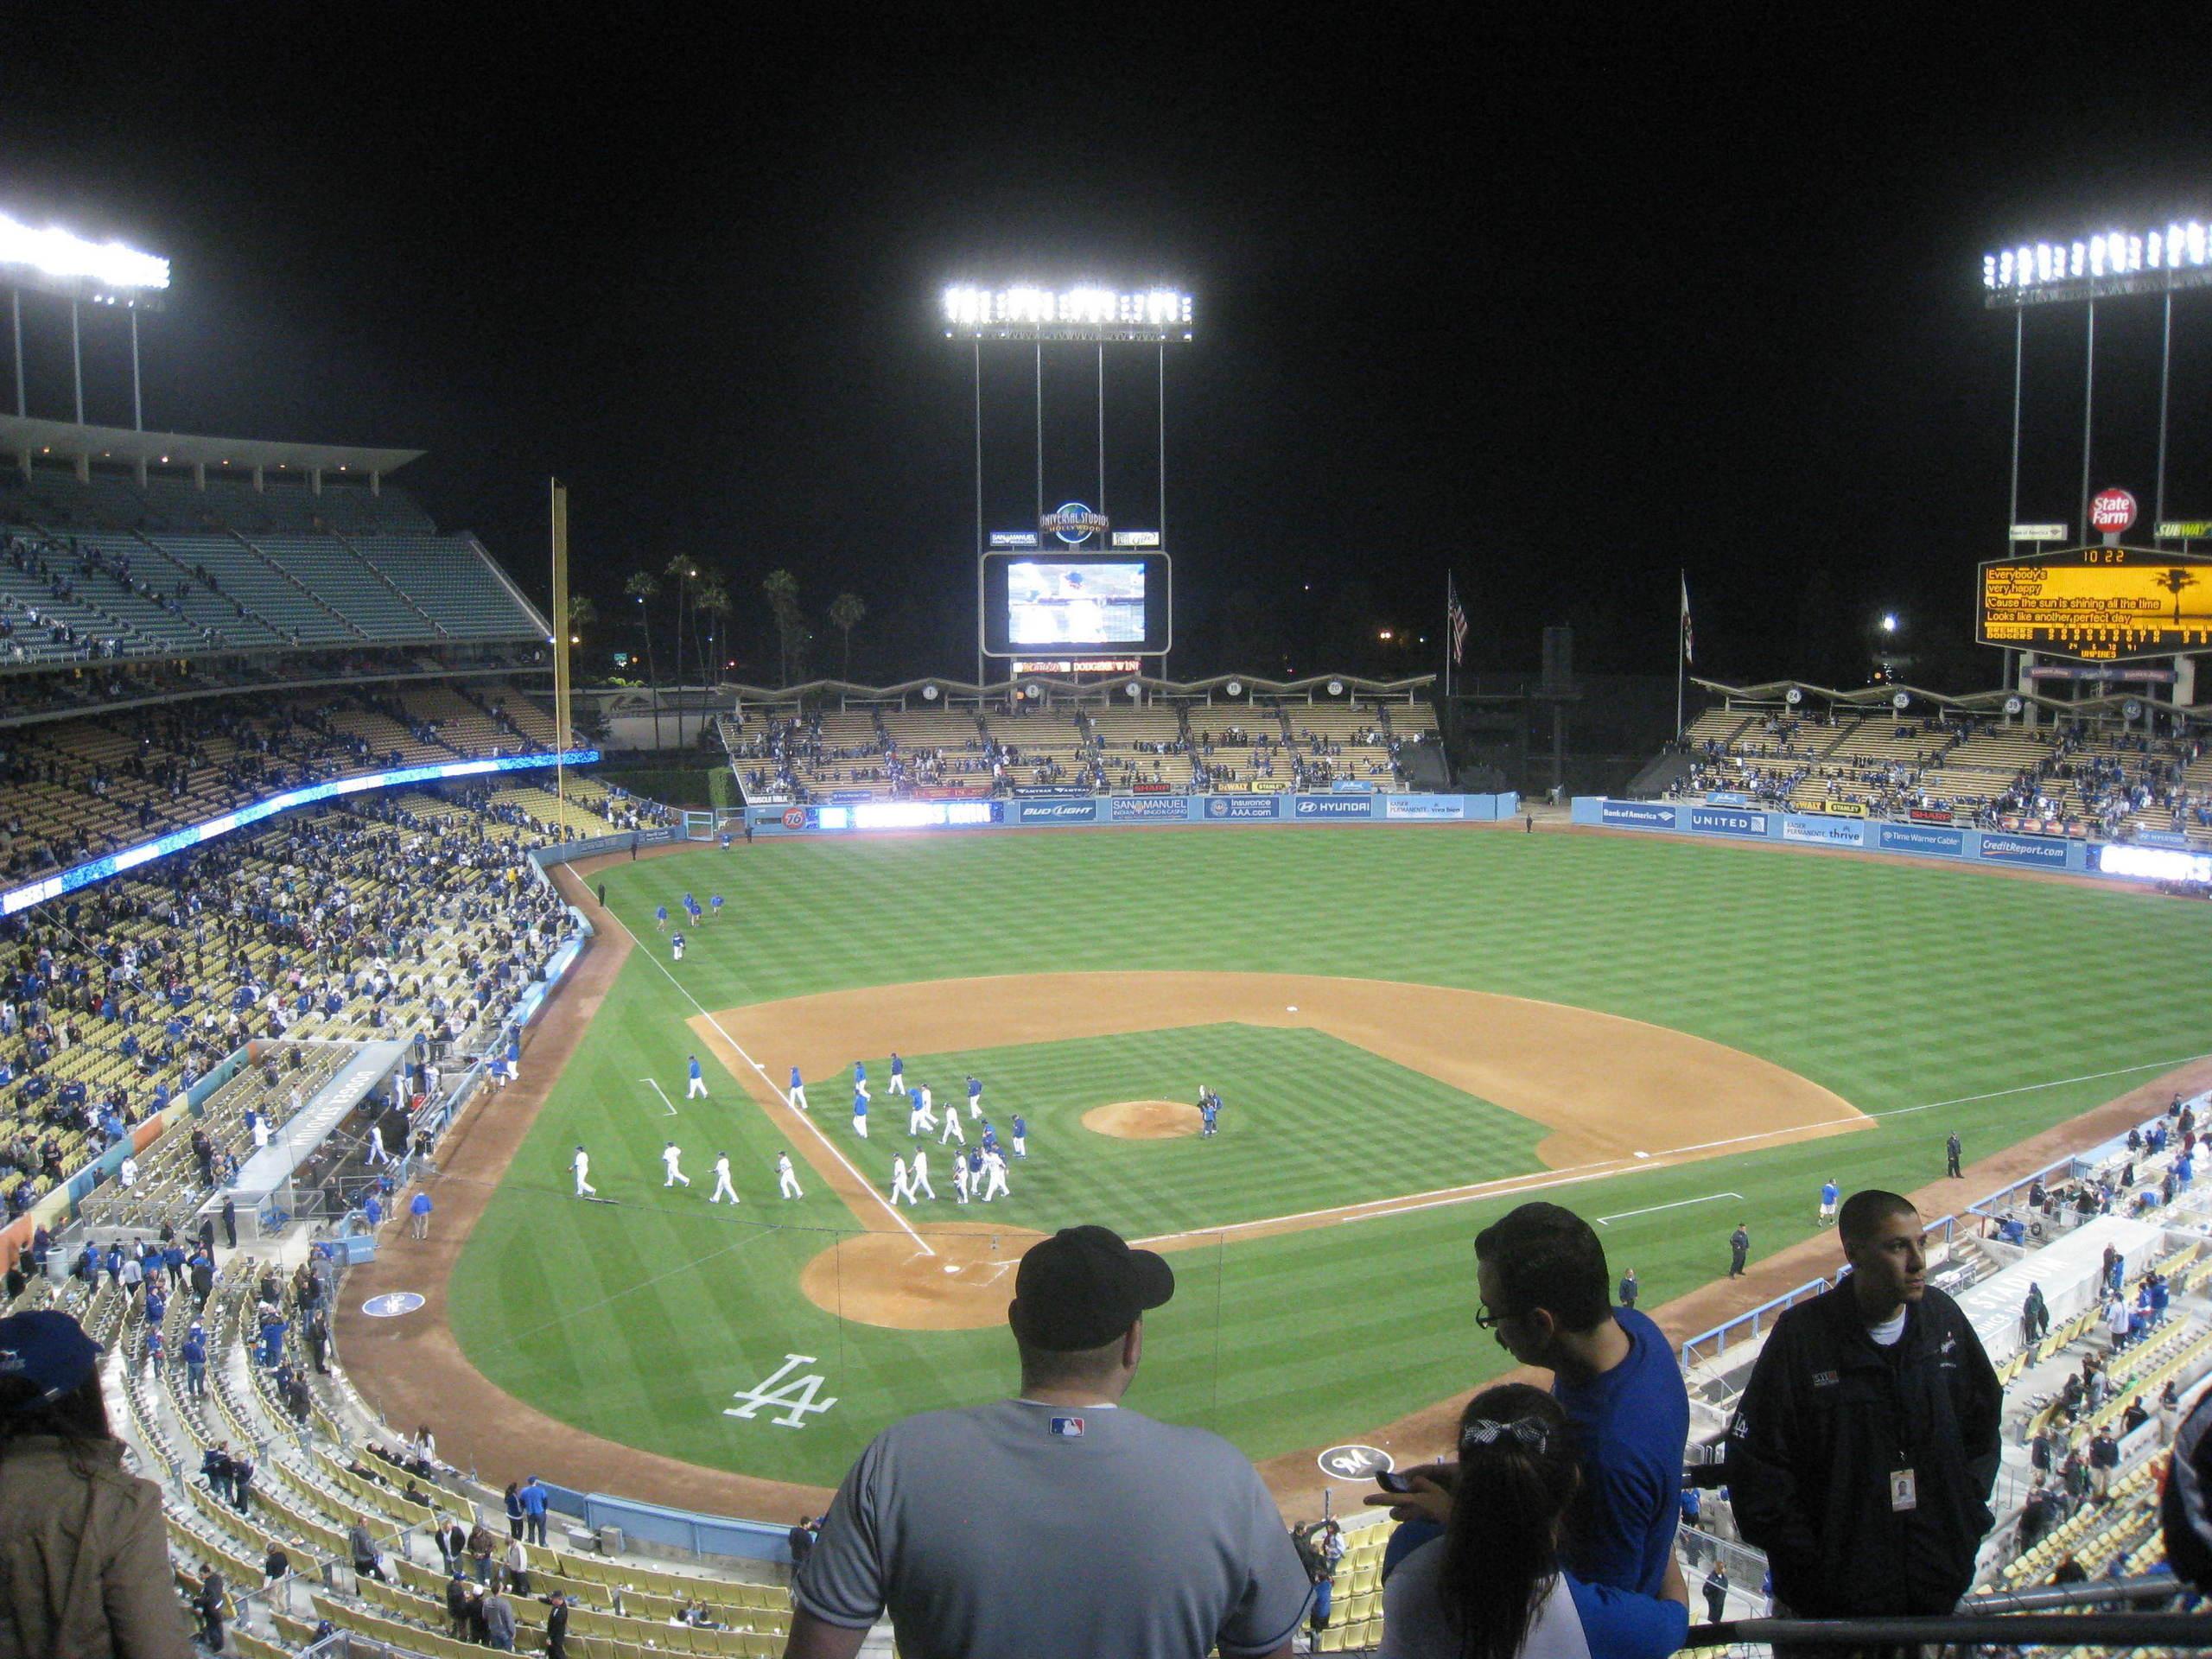 wallpaper.wiki-Download-Dodger-Stadium-Backgrounds-PIC-WPB009270